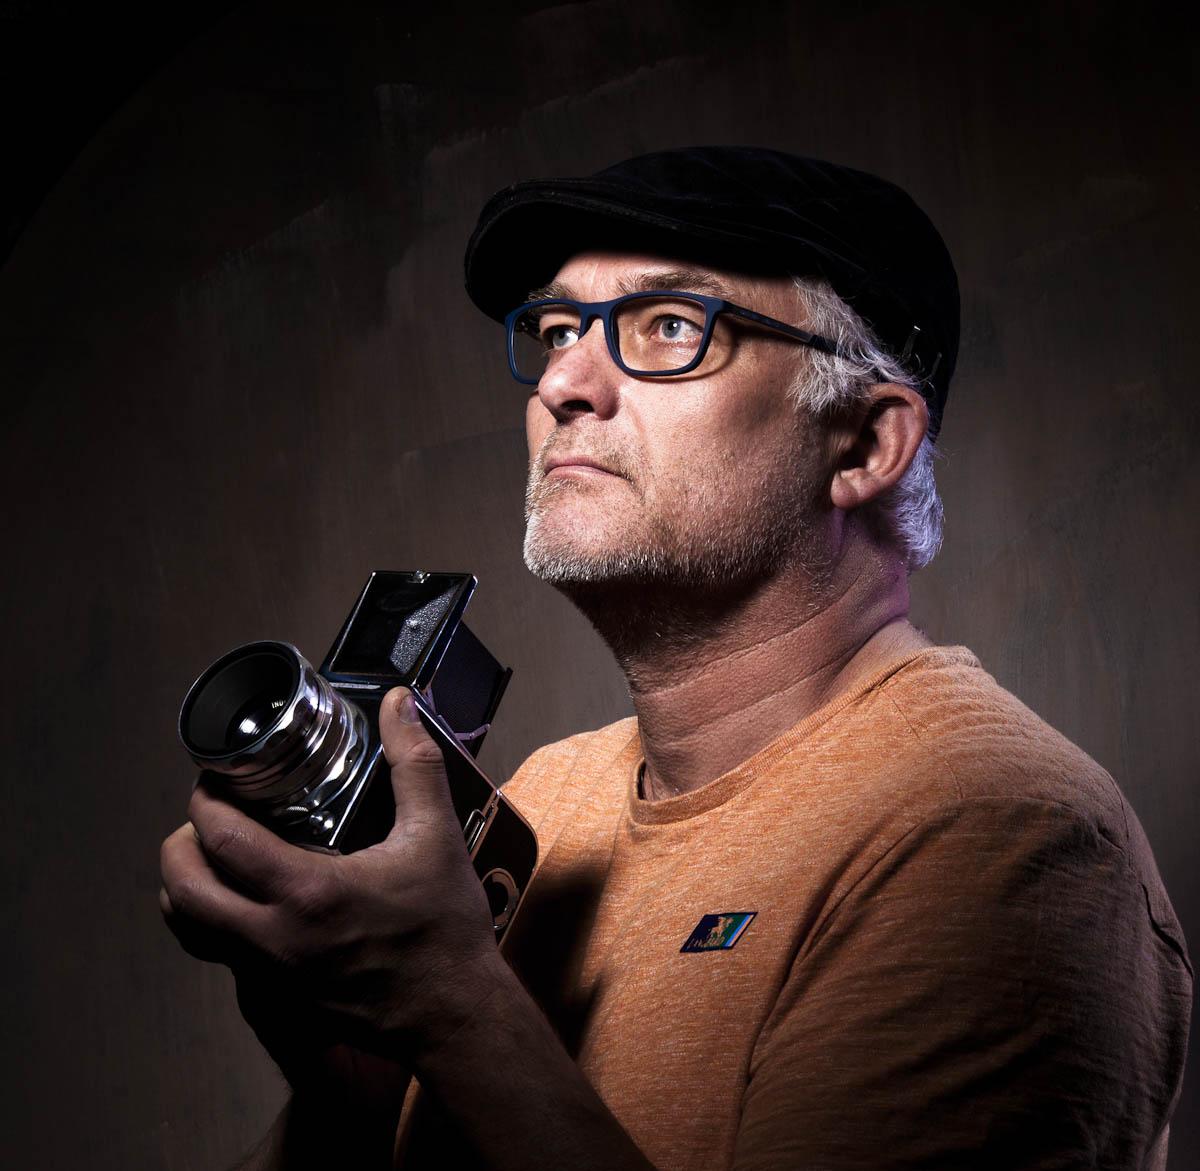 Fotograaf Rudy Rosman